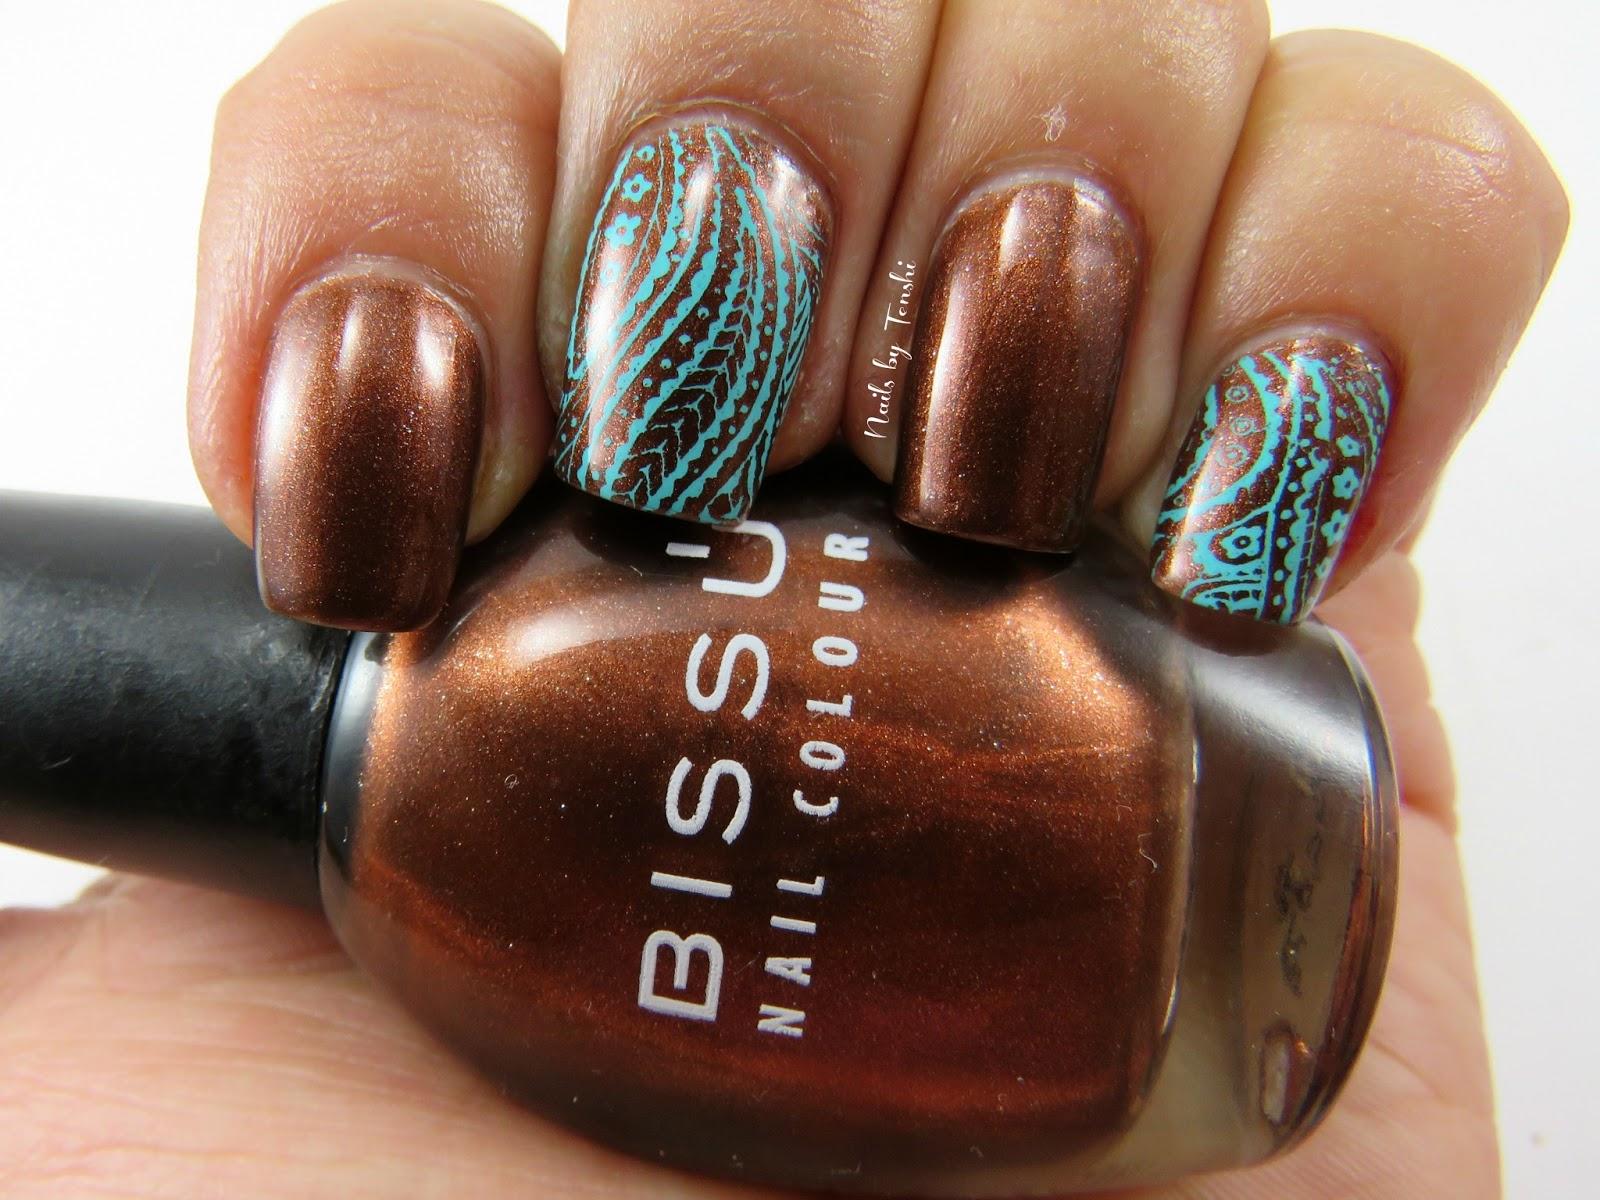 Nails by Tenshi: Reto Colores 2: Marrón